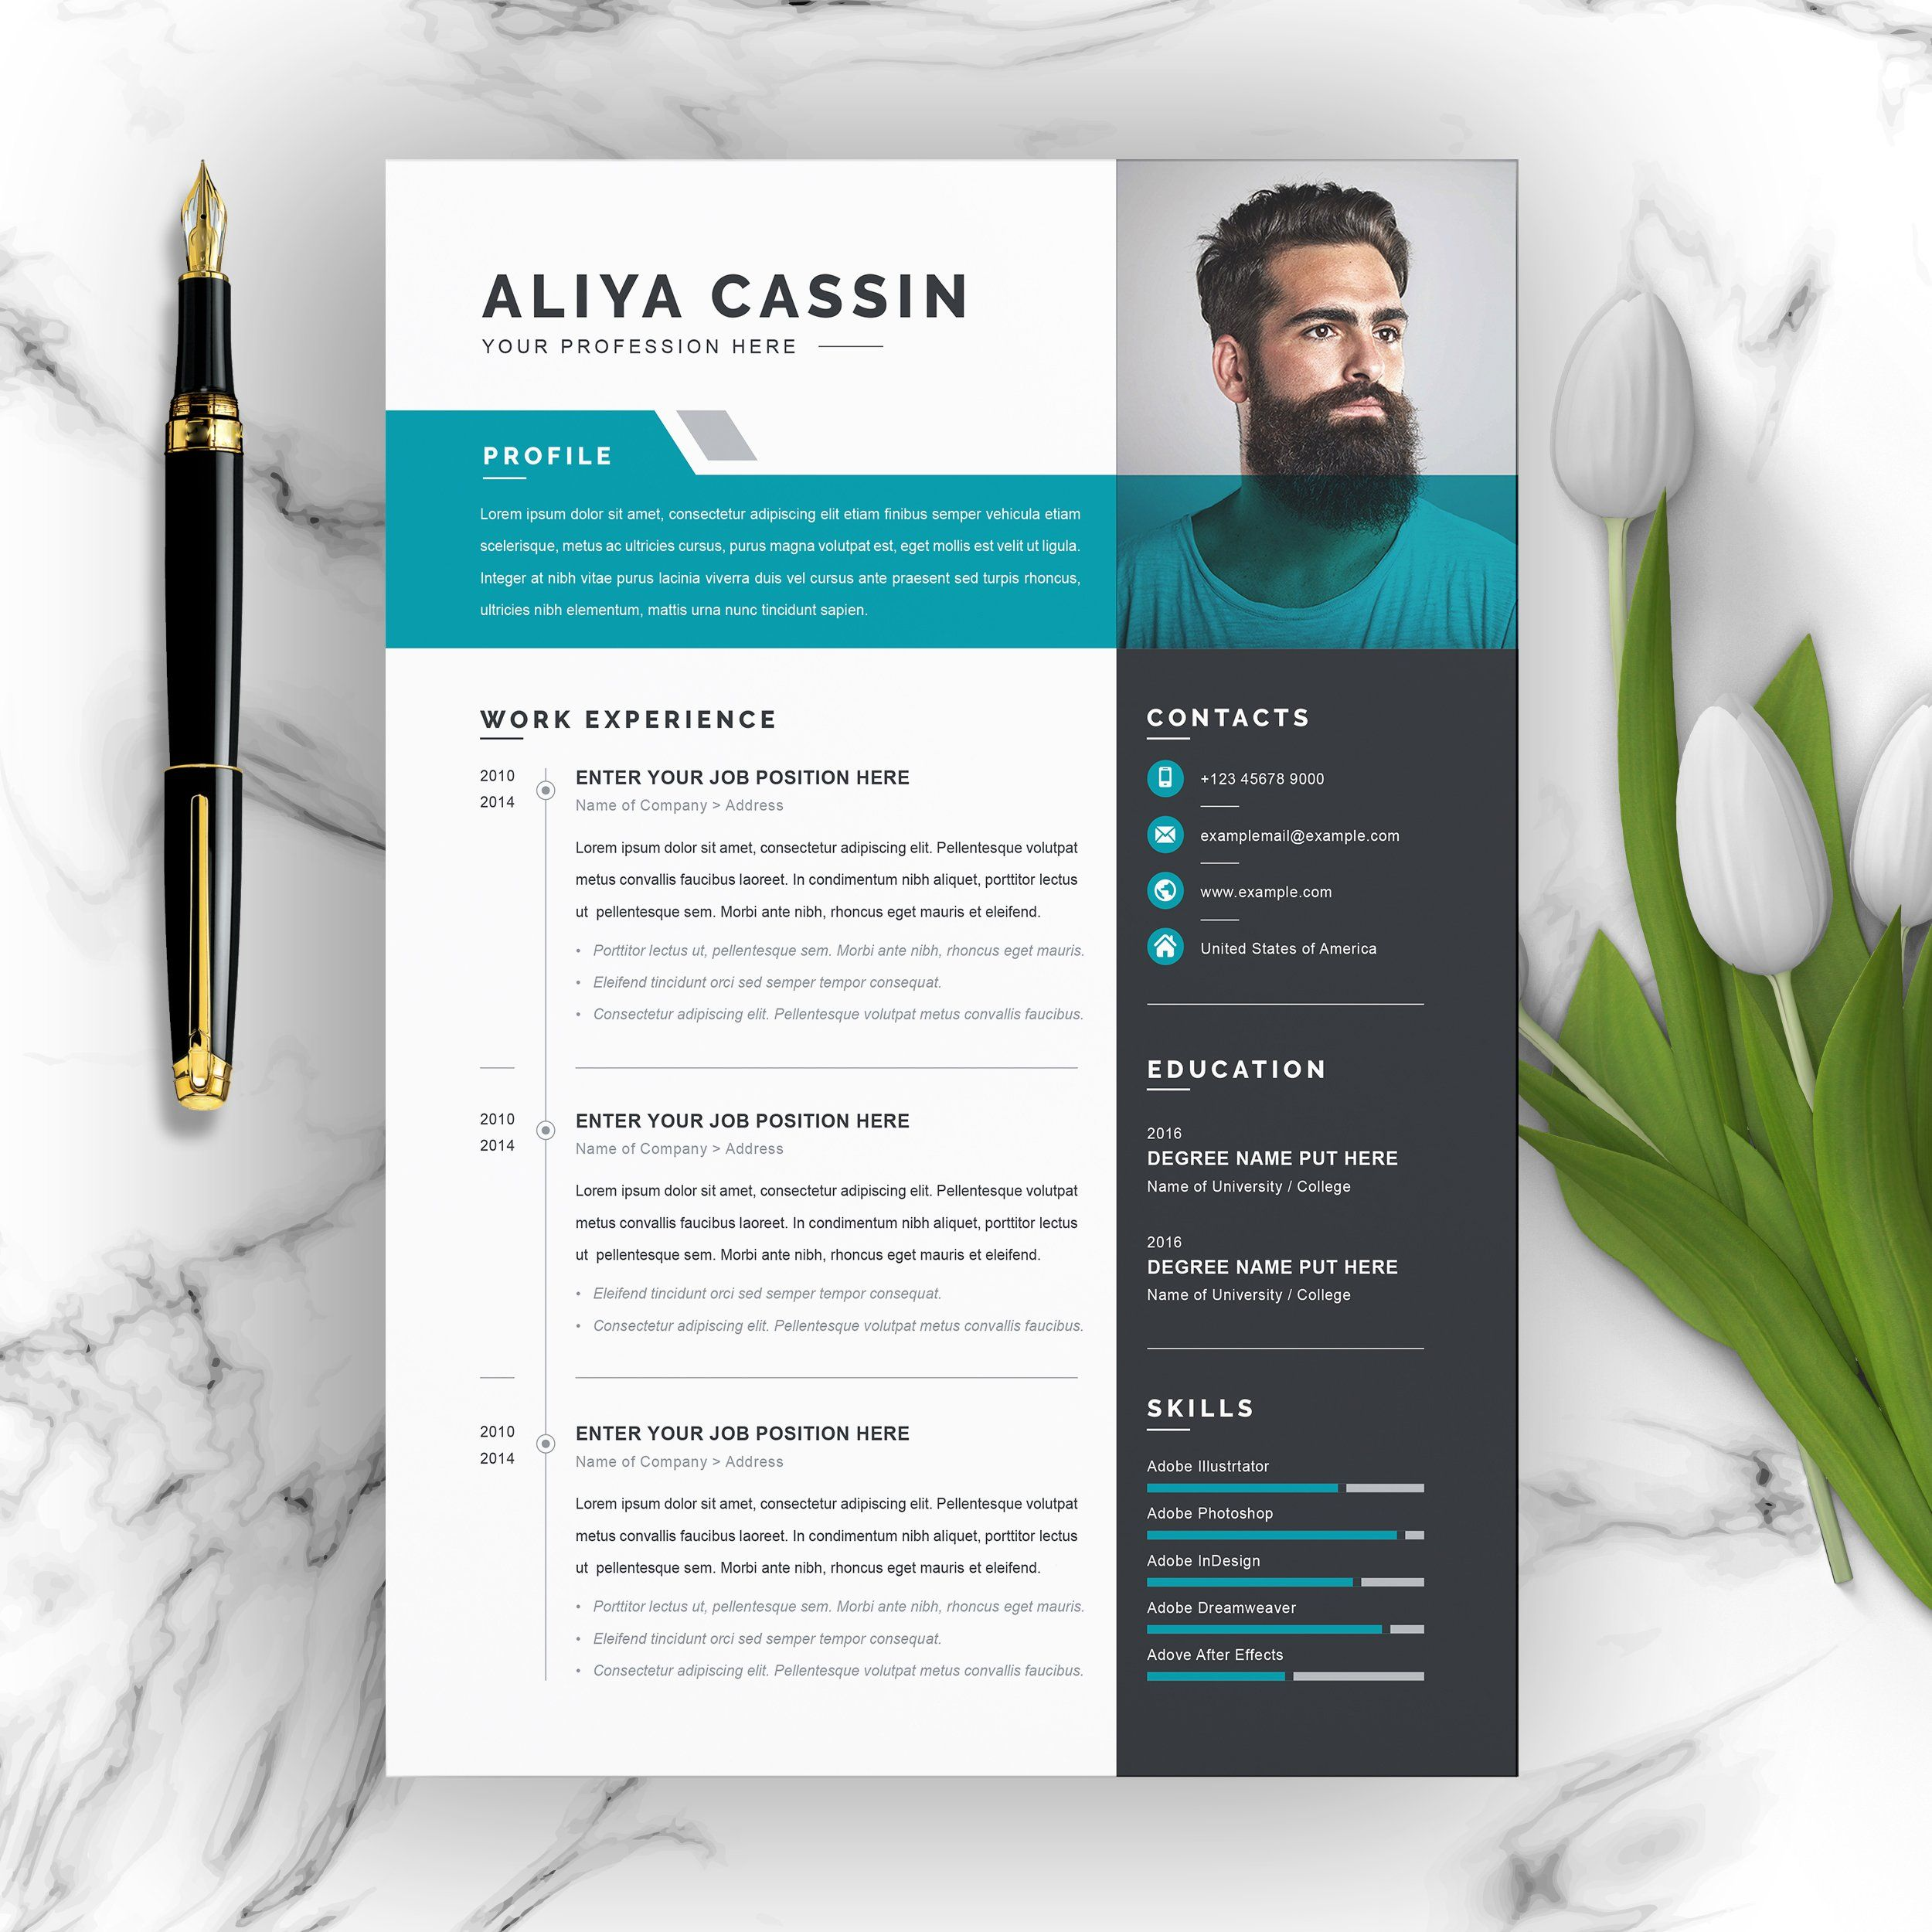 Professional Resume / CV Template in 2020 Cv template